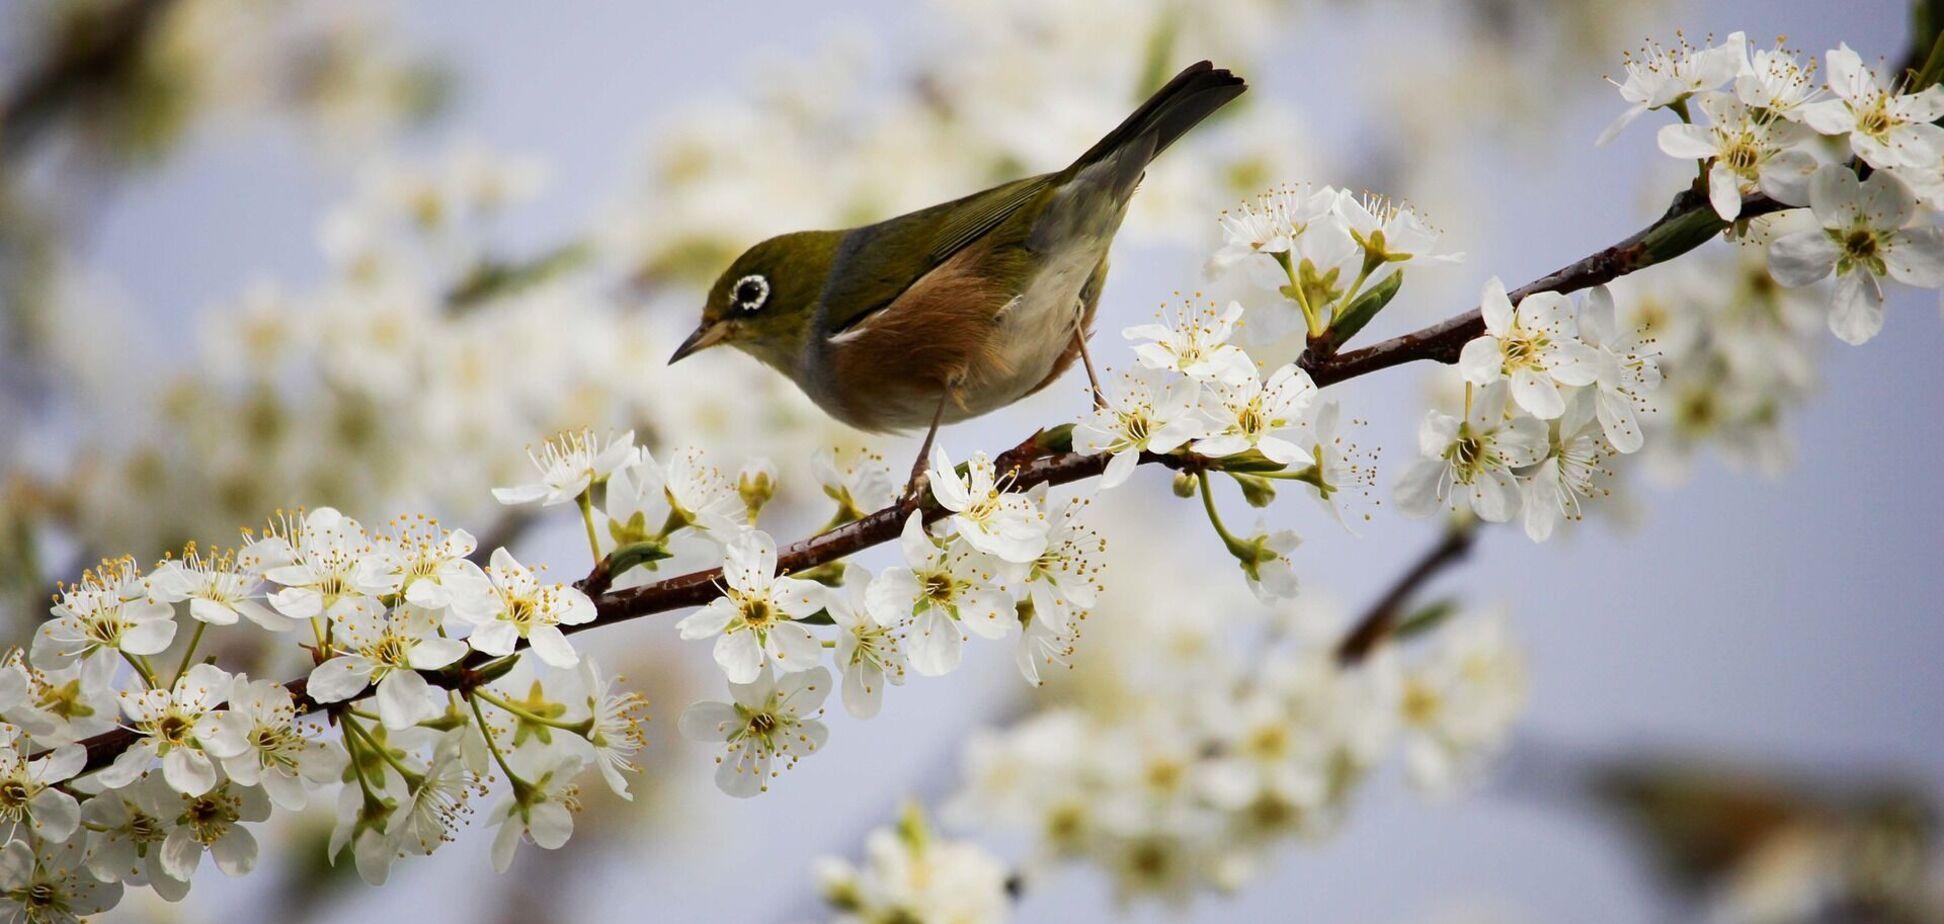 17 квітня: свята, прикмети й іменинники